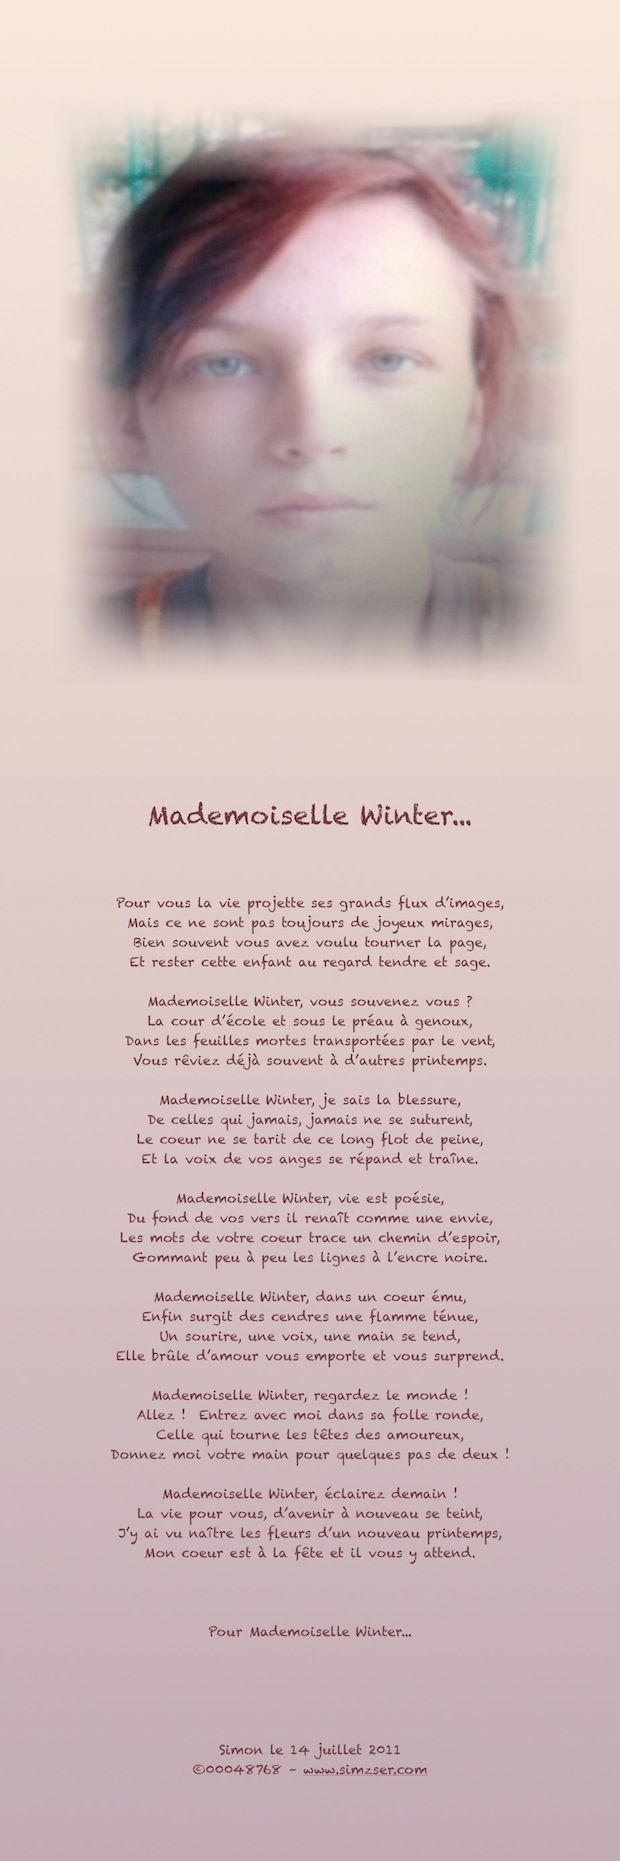 http://img834.imageshack.us/img834/4982/mademoisellewinter.jpg